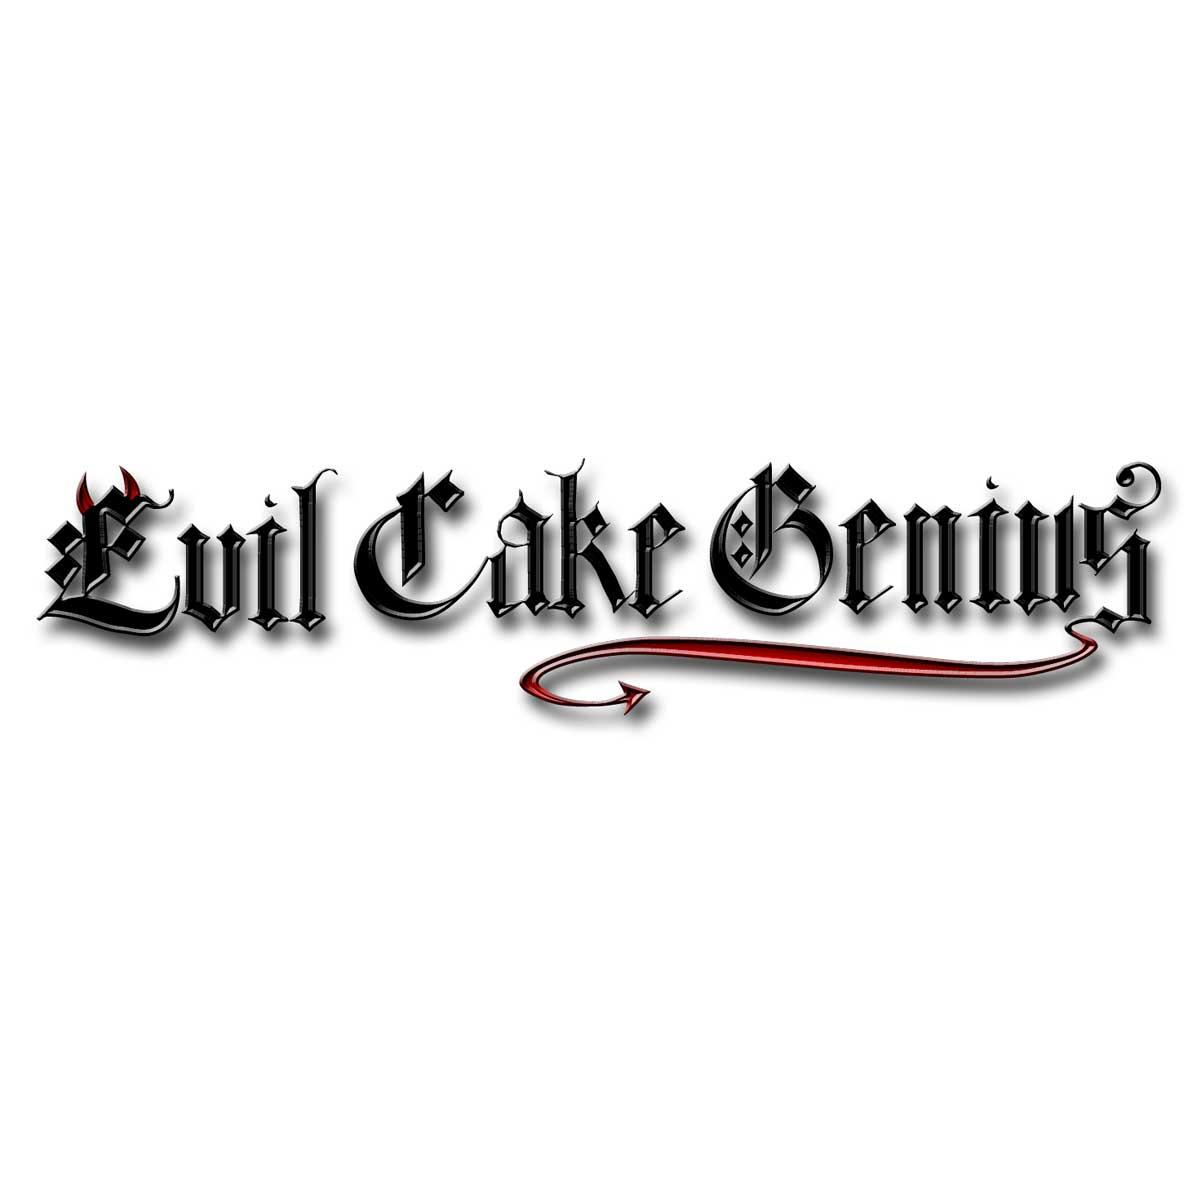 Evil Cake Genius E-Gift Certificate